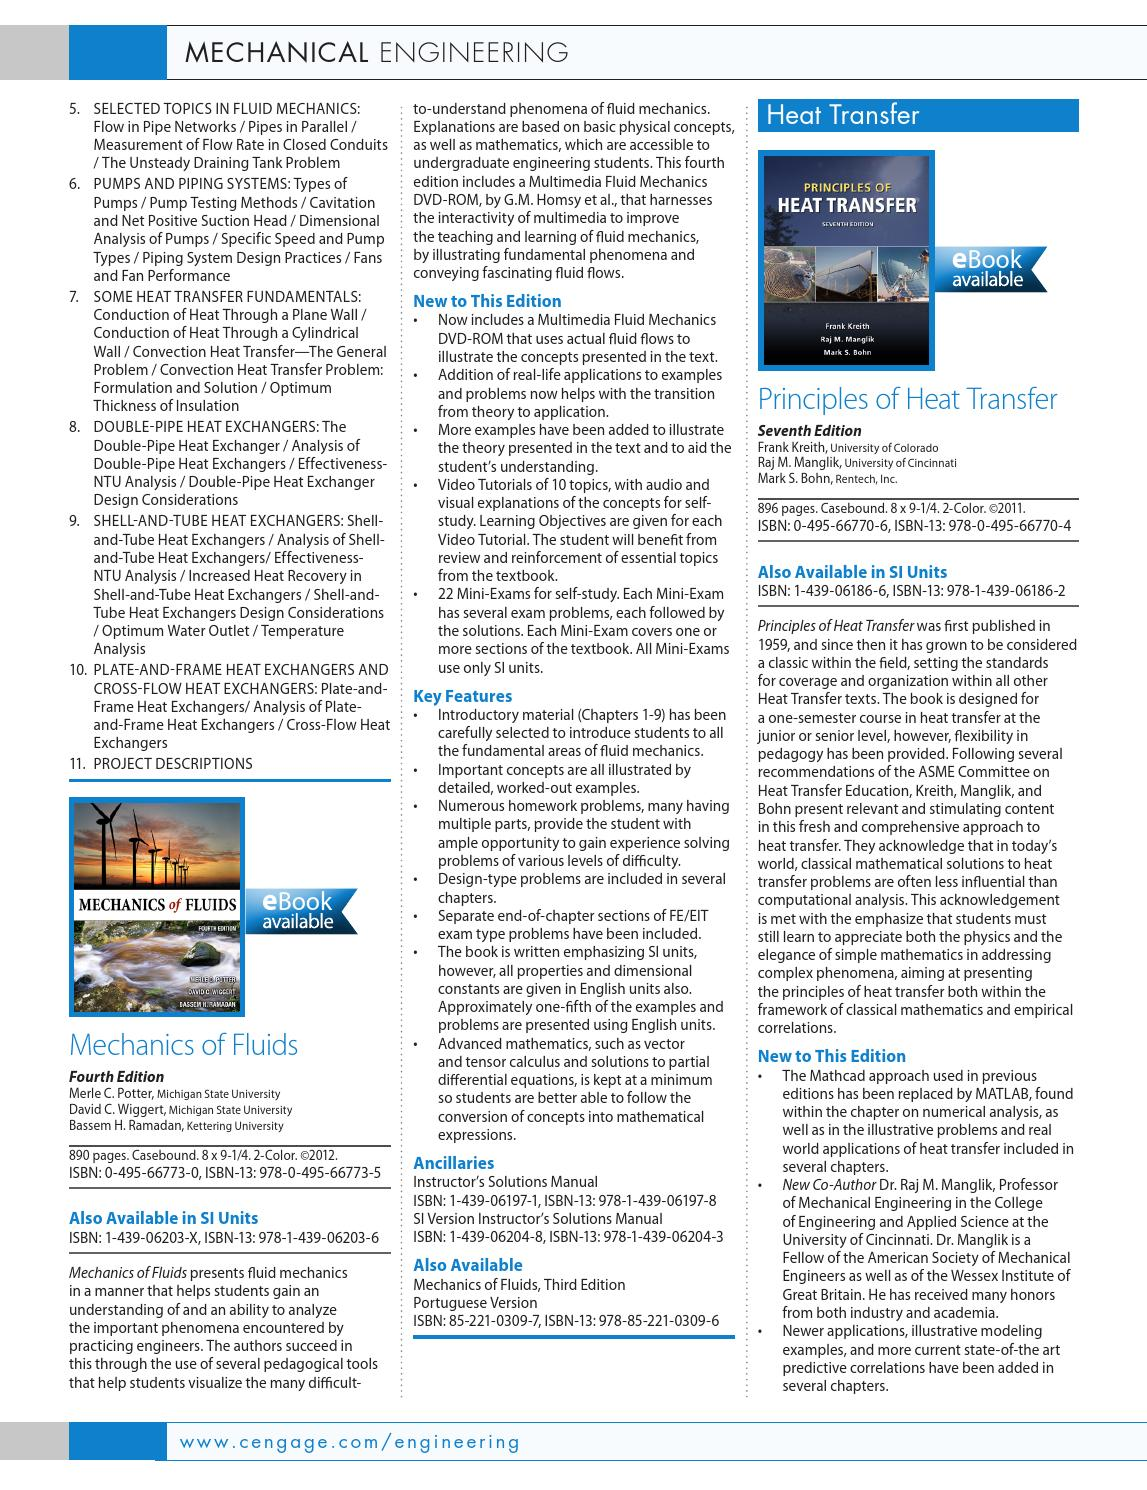 Cengage Learning Global Engineering 2015 Mechanical Engineering Catalog by  Cengage Learning Global Engineering - issuu